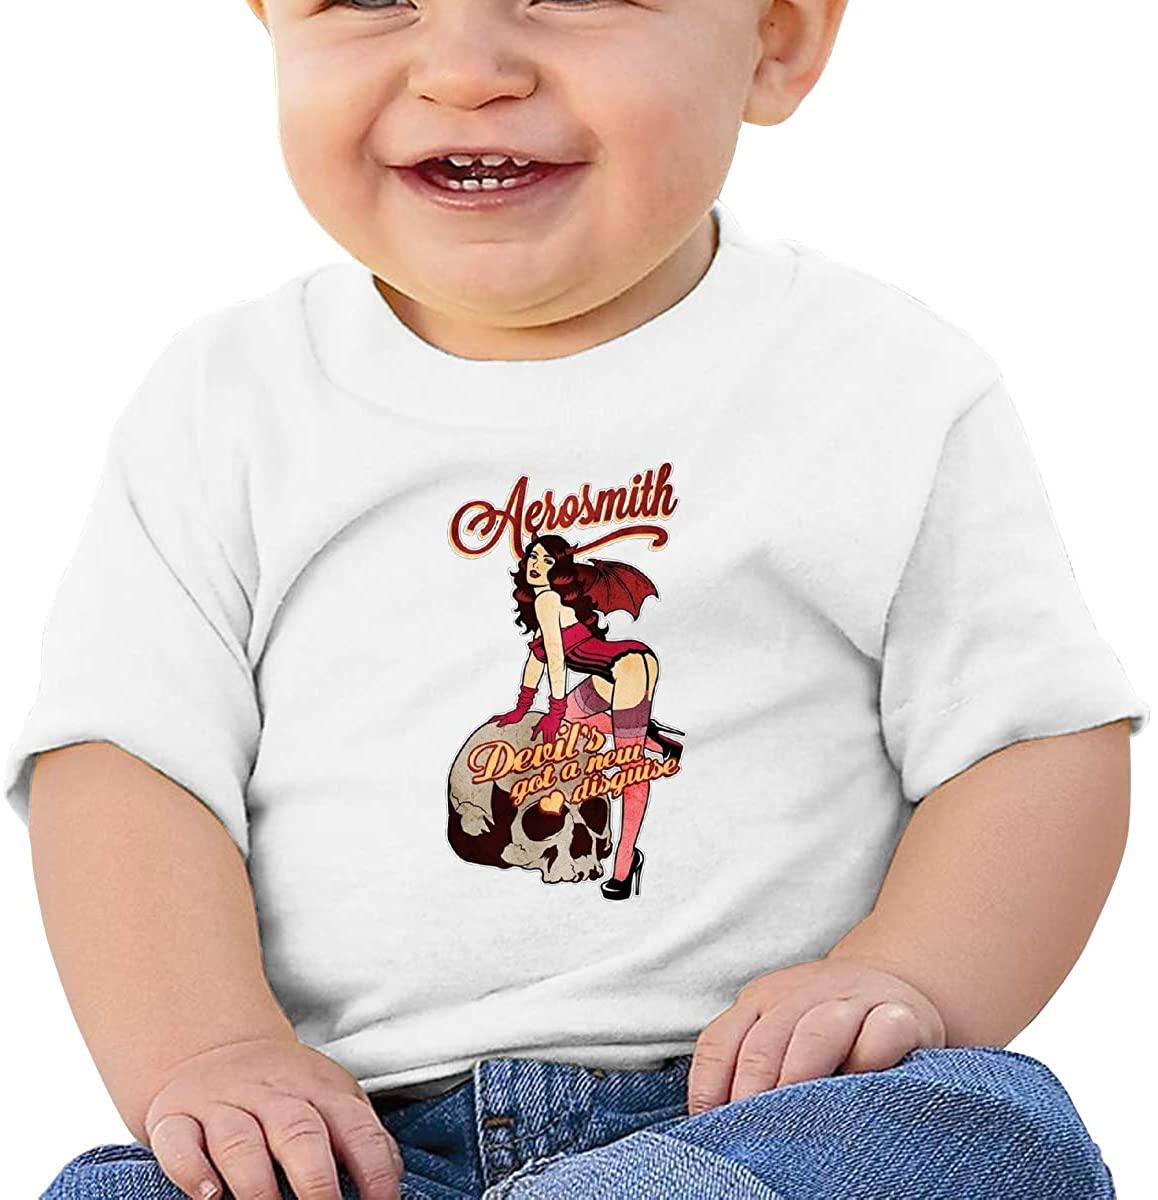 6-24 Months Boy and Girl Baby Short Sleeve T-Shirt Aerosmith Original Minimalist Style White